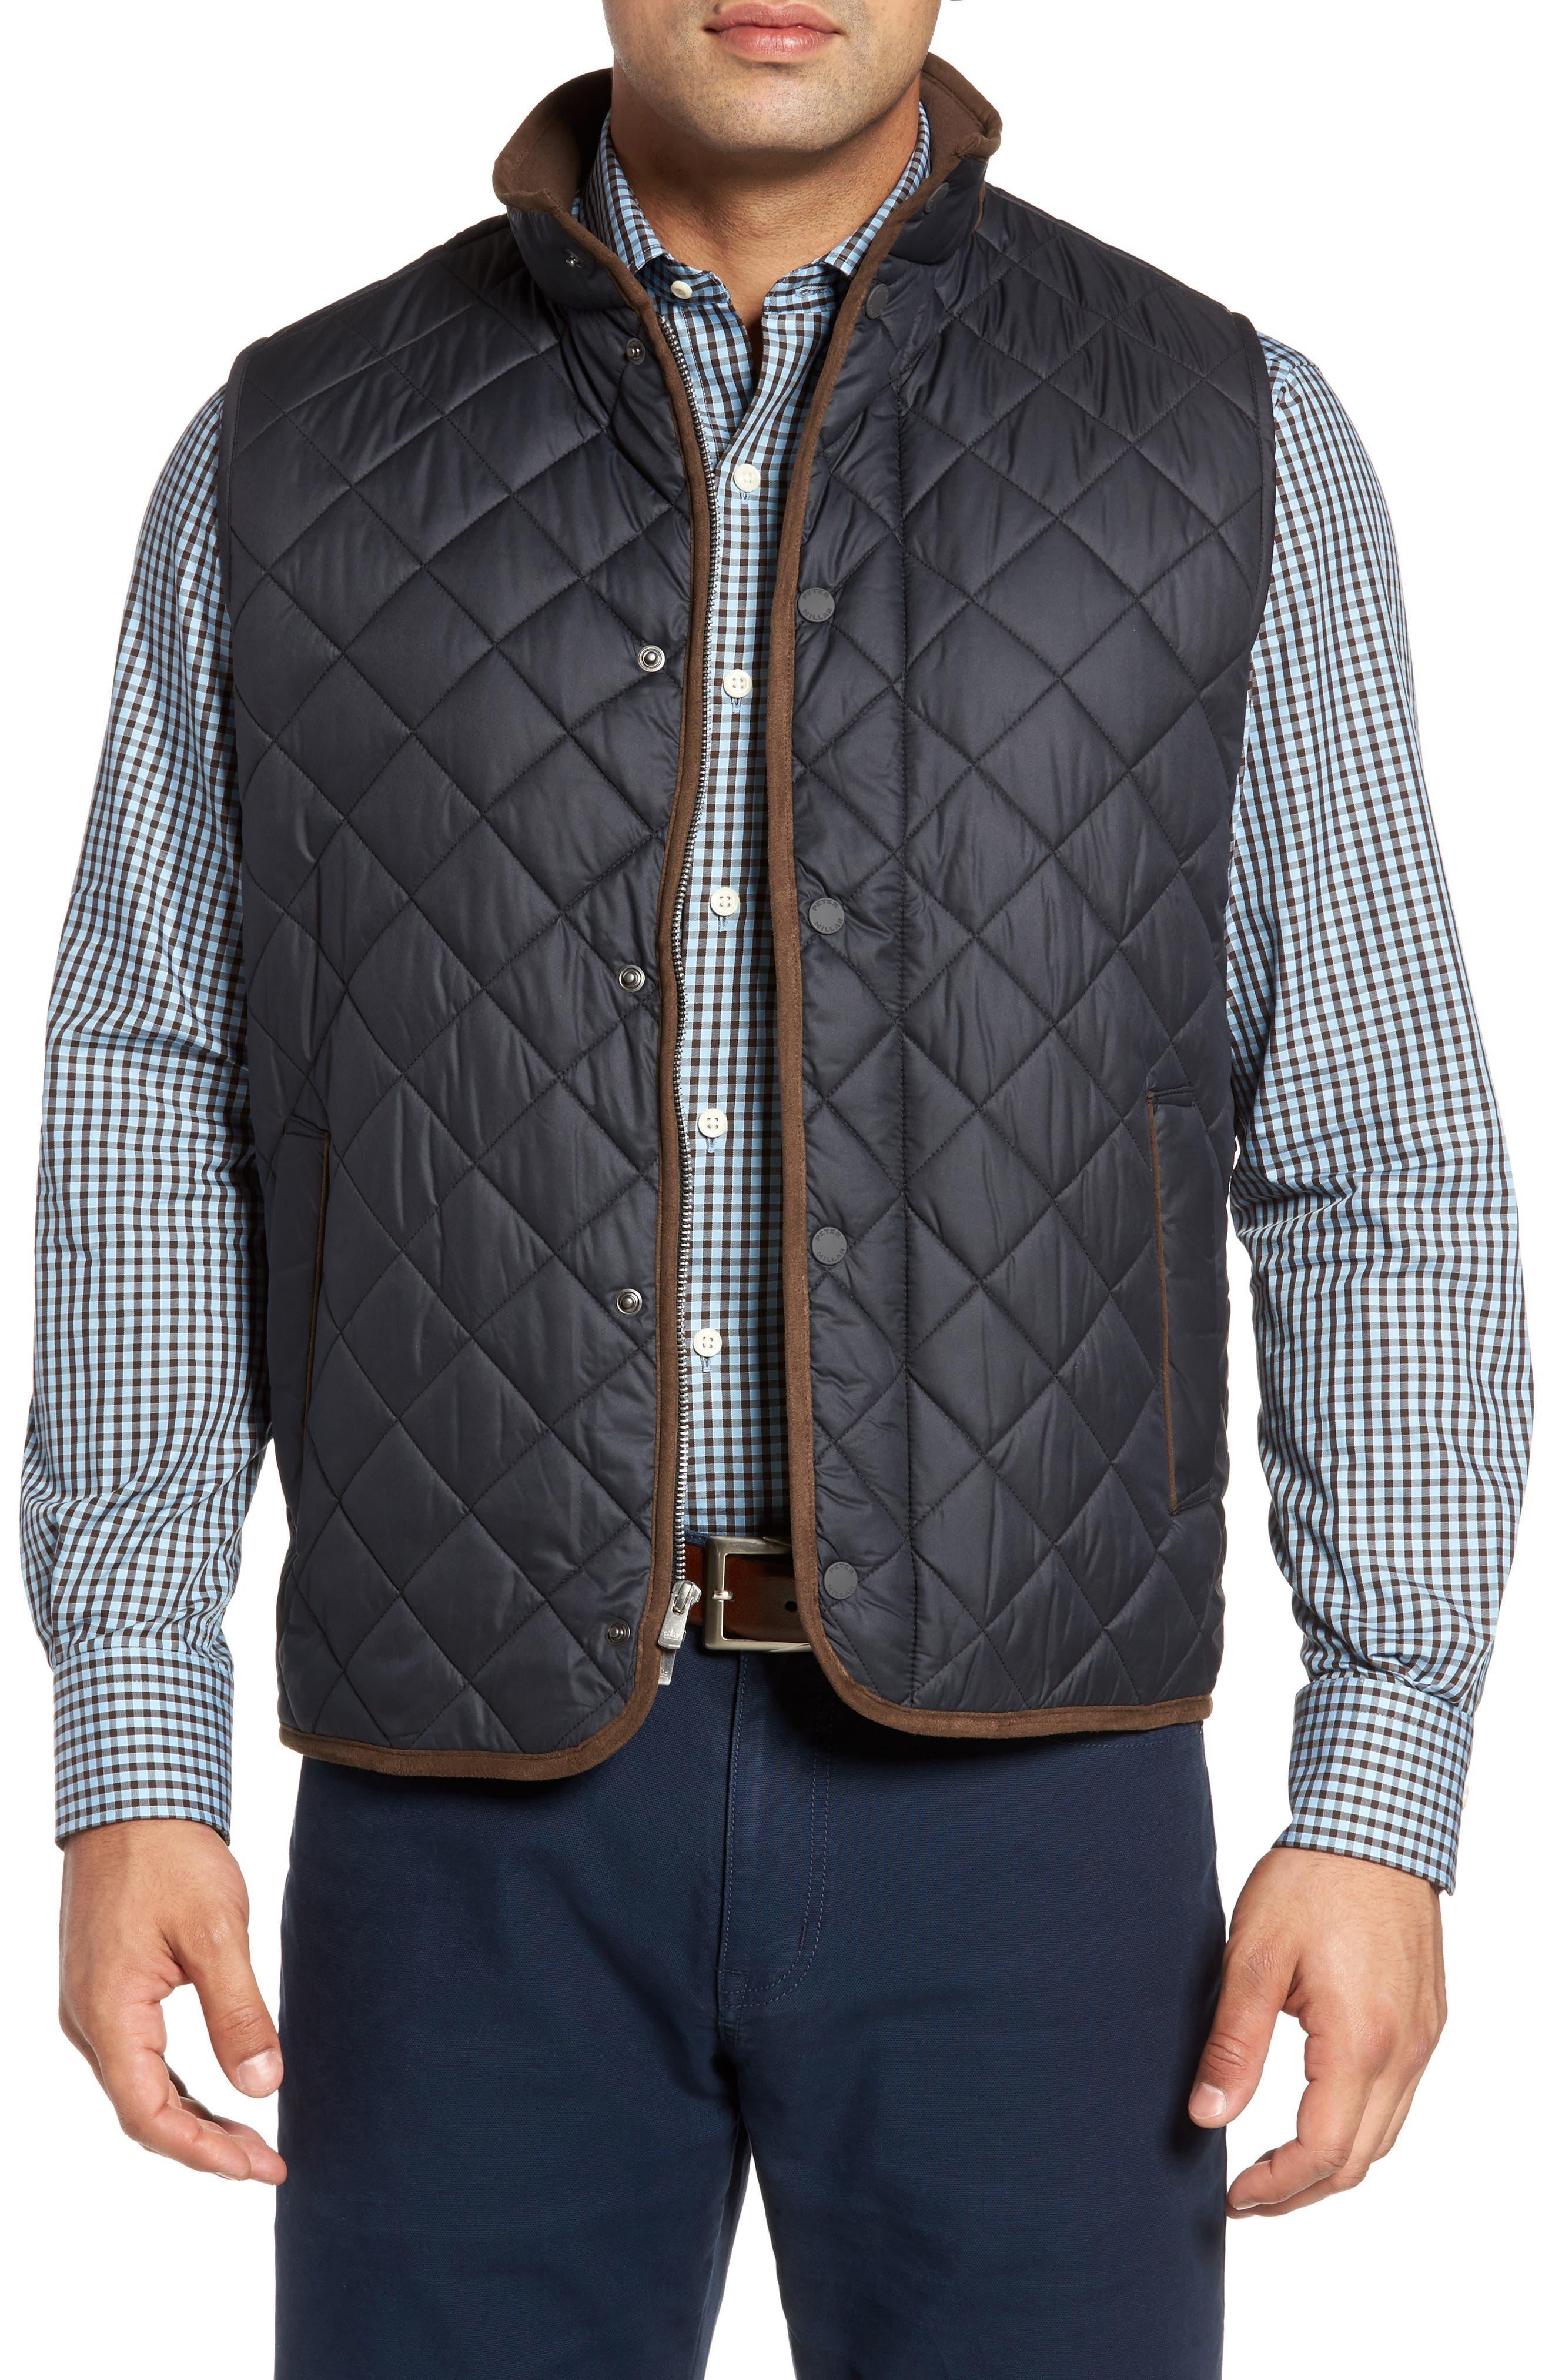 Essex Quilted Vest,                         Main,                         color, Black